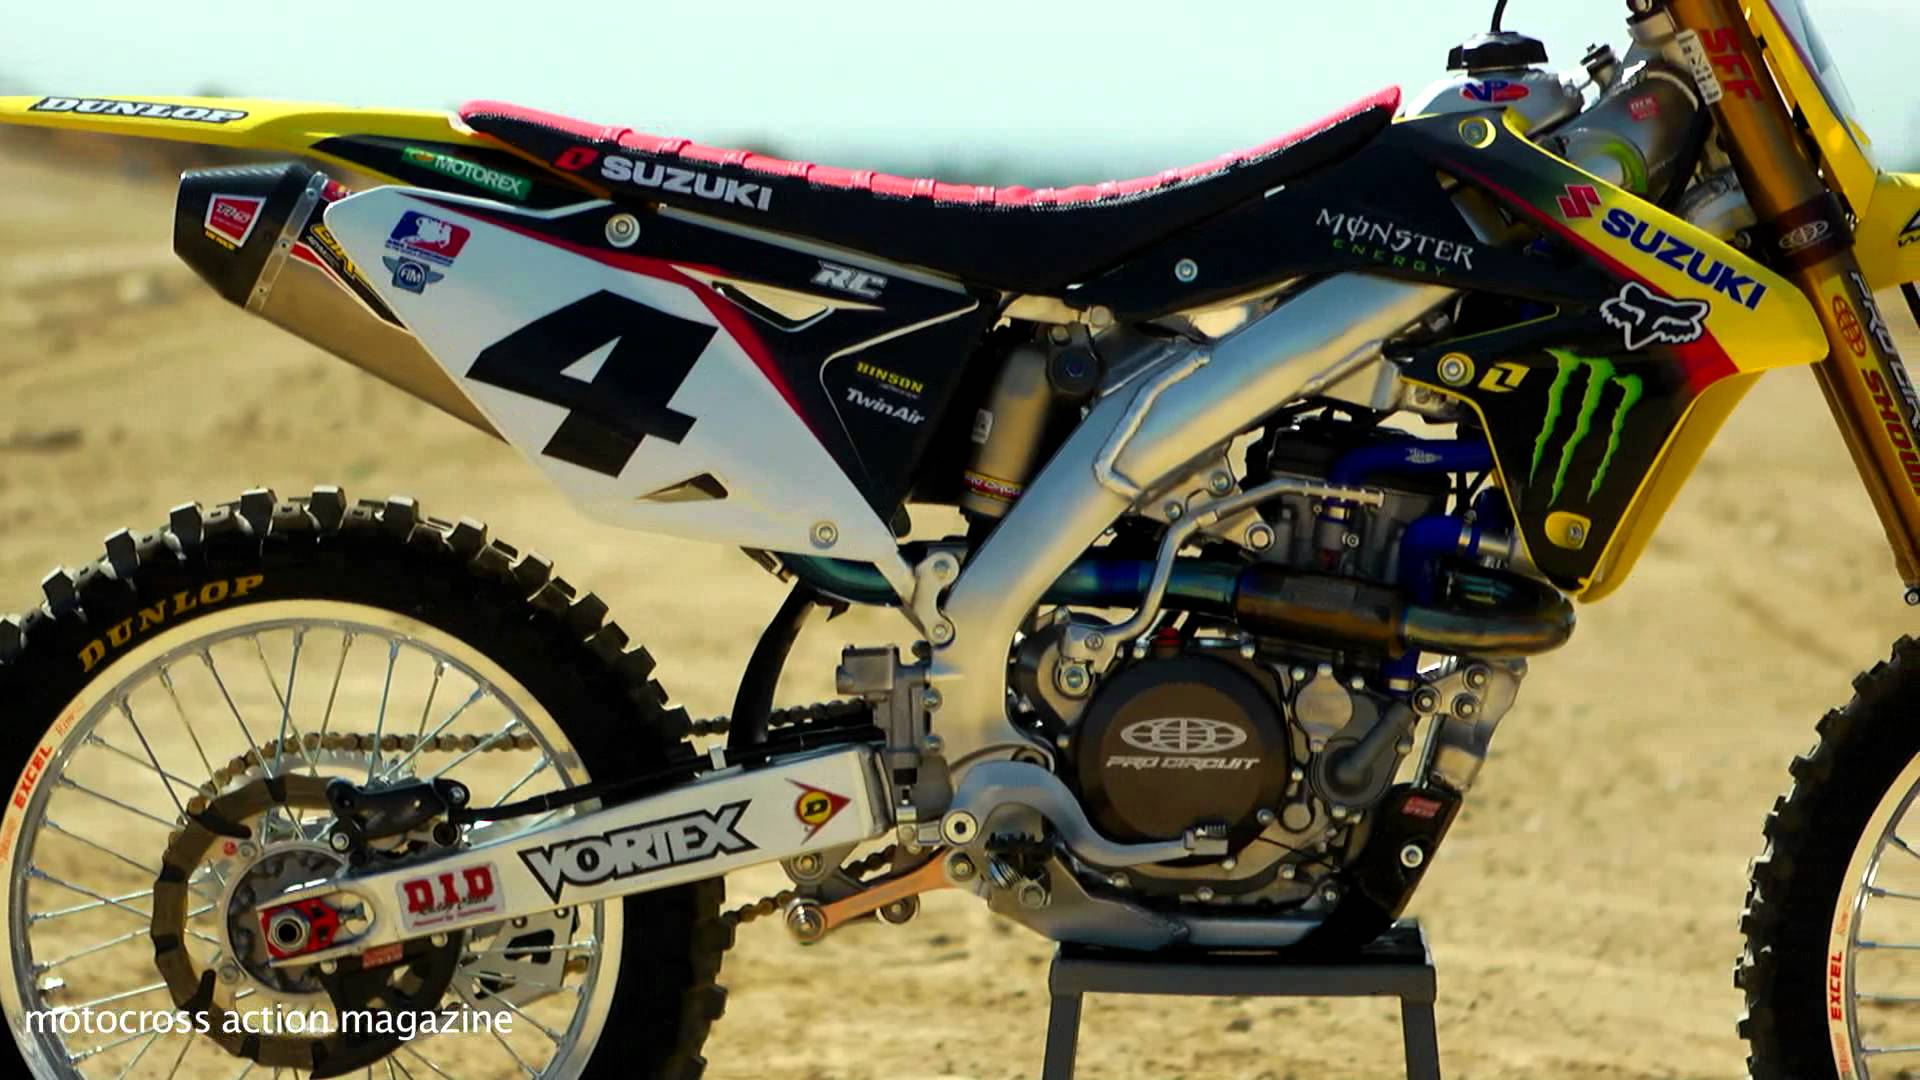 Motocross suzuki rmz 450